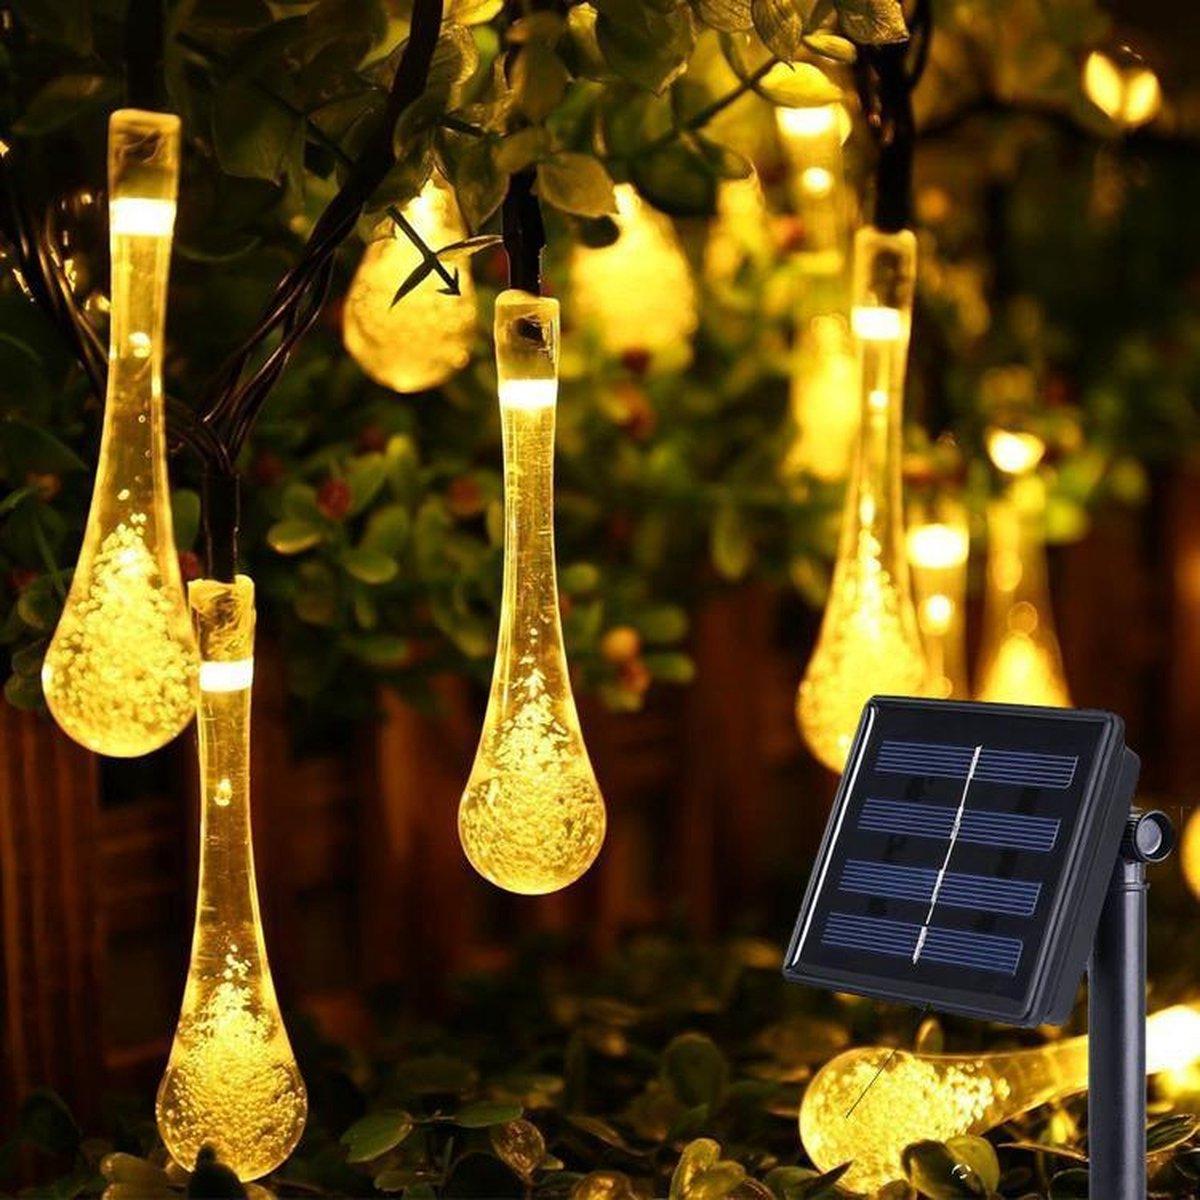 J-Pro Sfeer- en Tuinverlichting op Zonne-Energie - 50 Solar LED Druppels - 7m - Lichtsnoer - Lichtsl